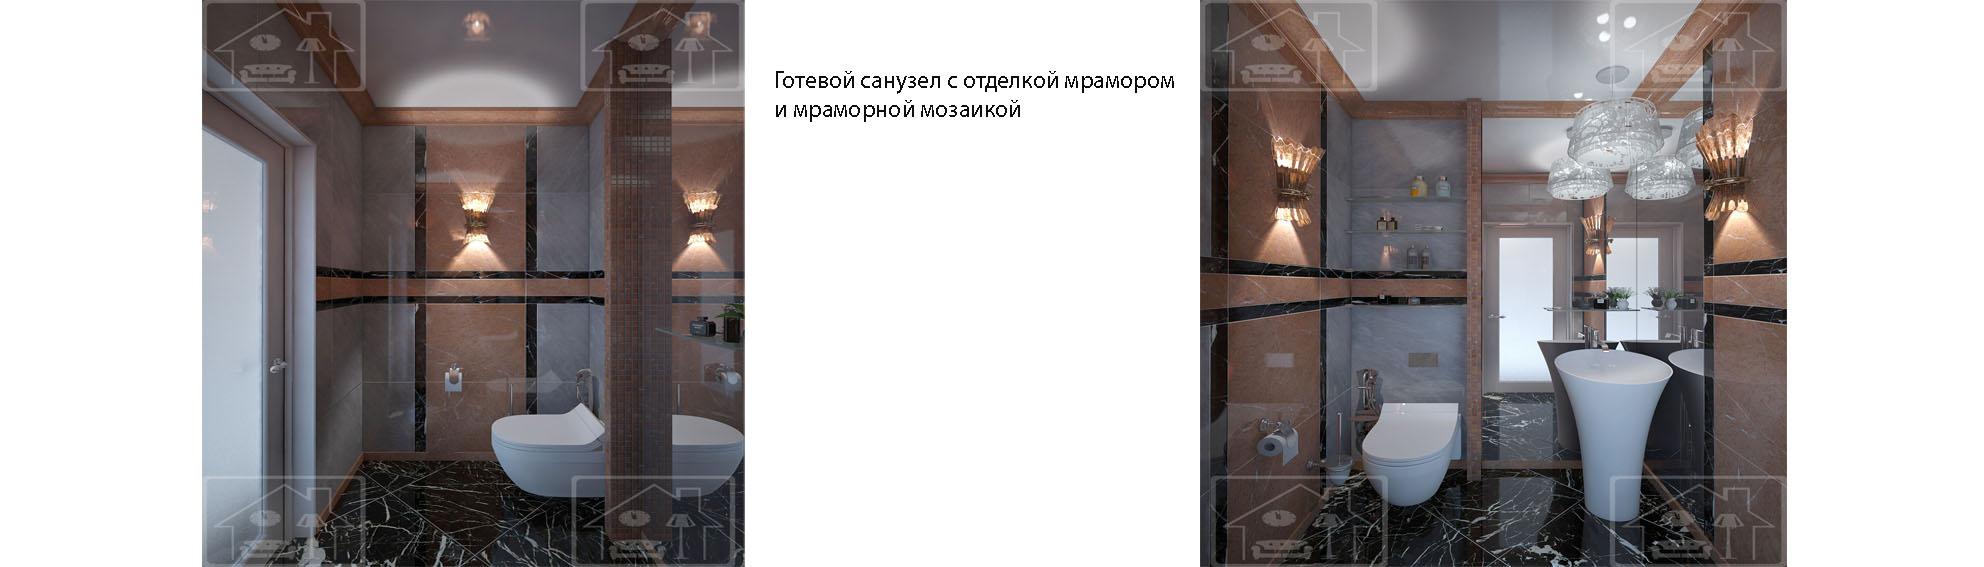 4-х комн_кв_Мичуринский проспект_Гостевой Санузел 3